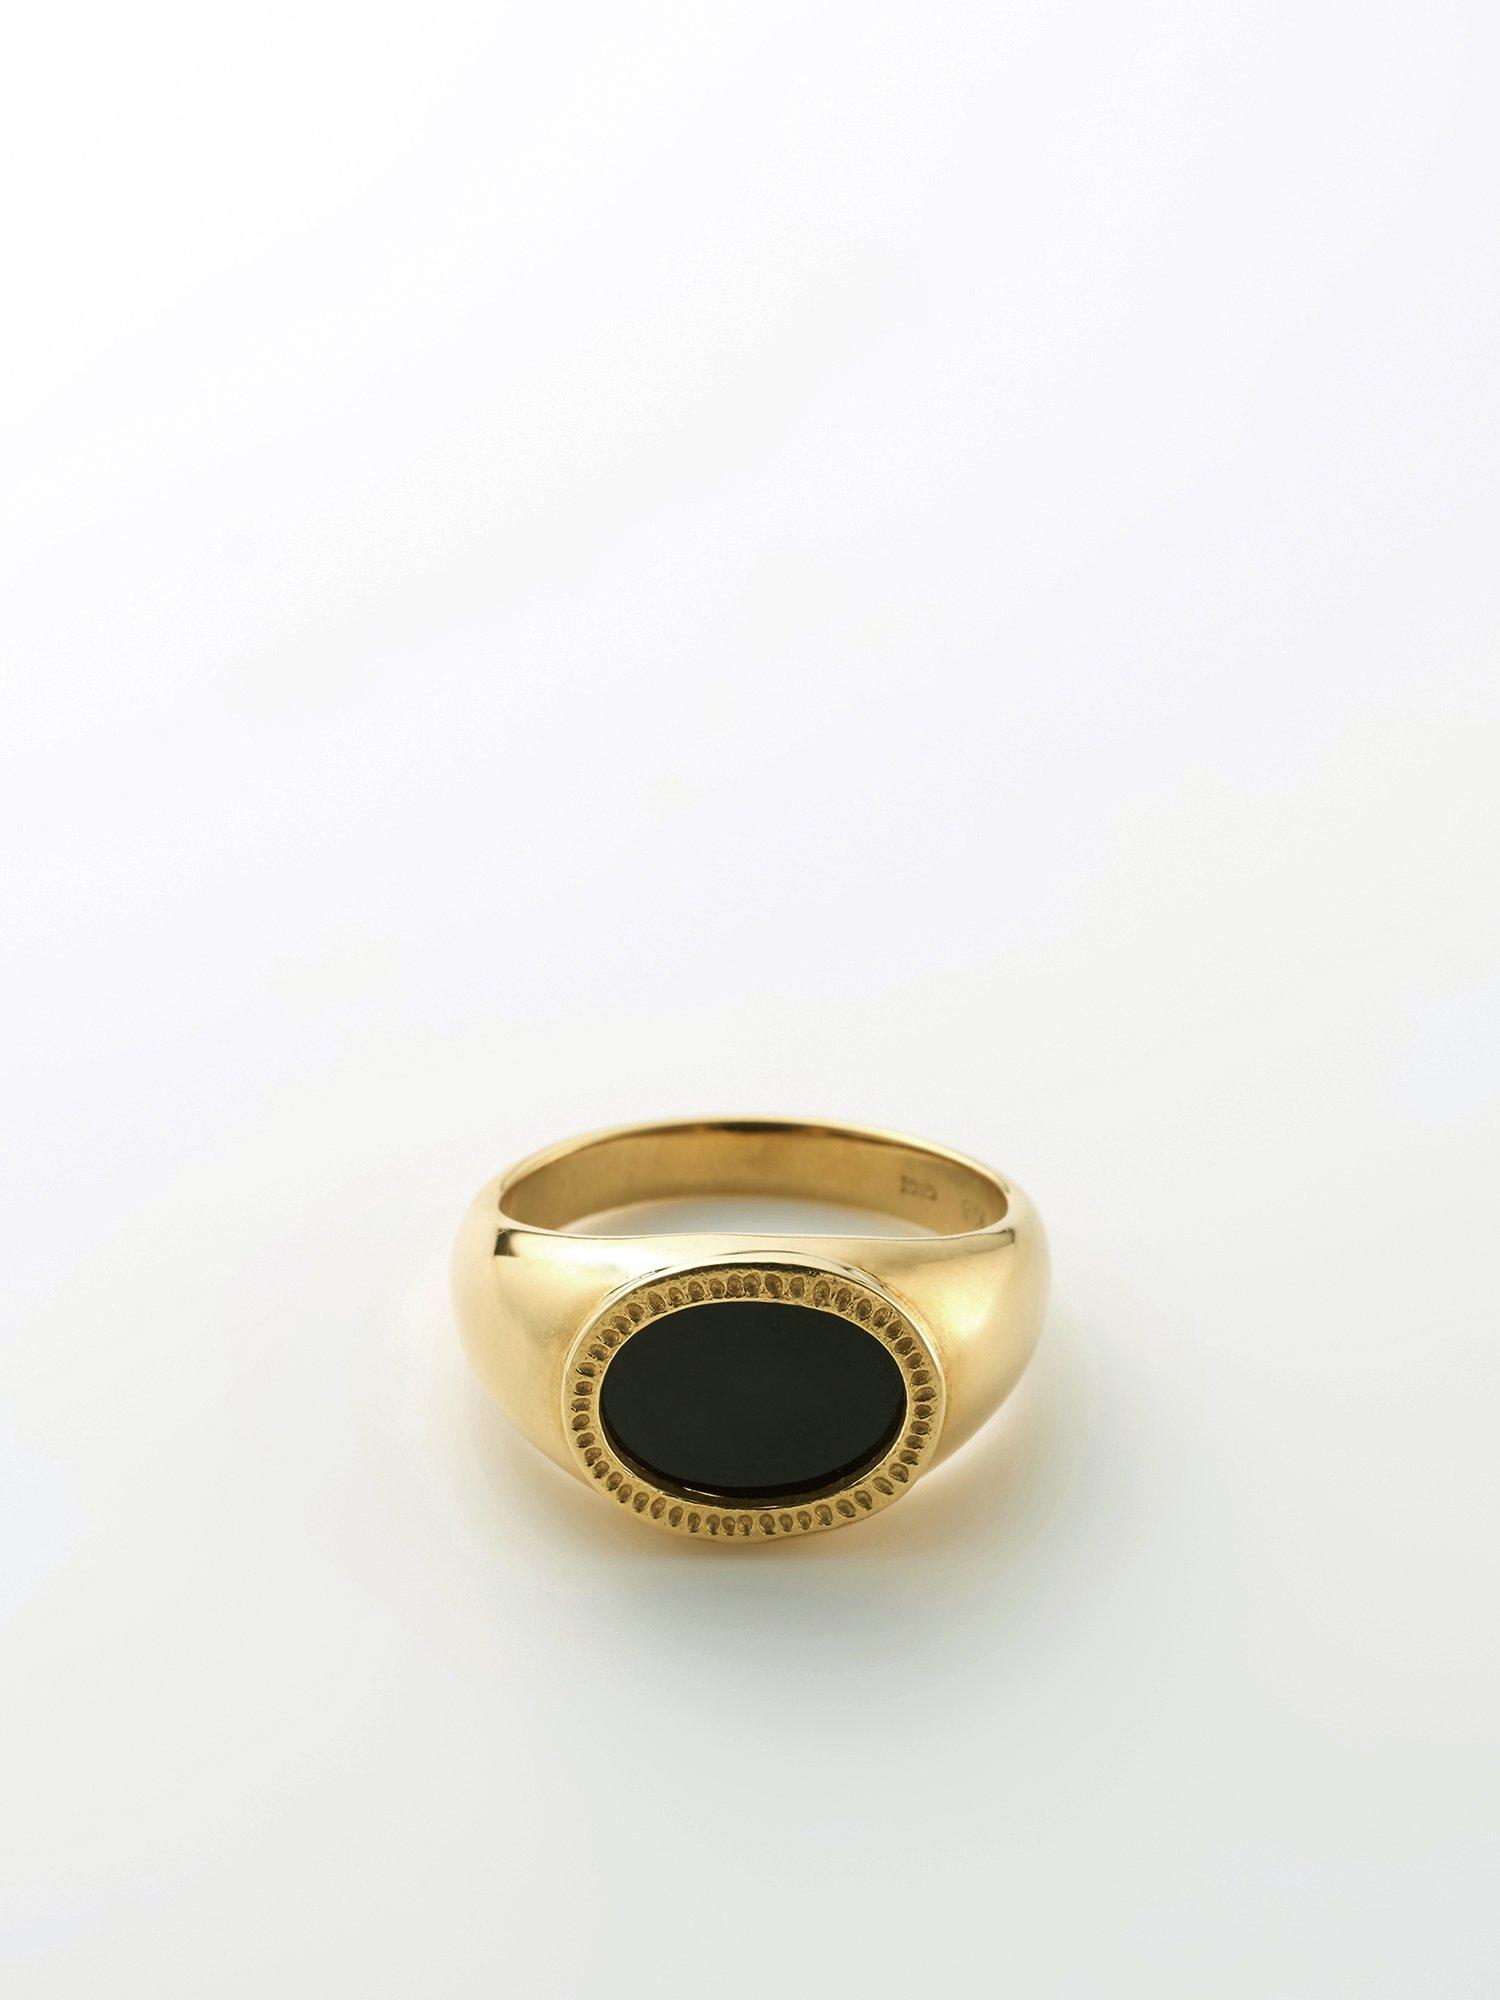 HELIOS / Onix signet ring / 12号 / 在庫商品